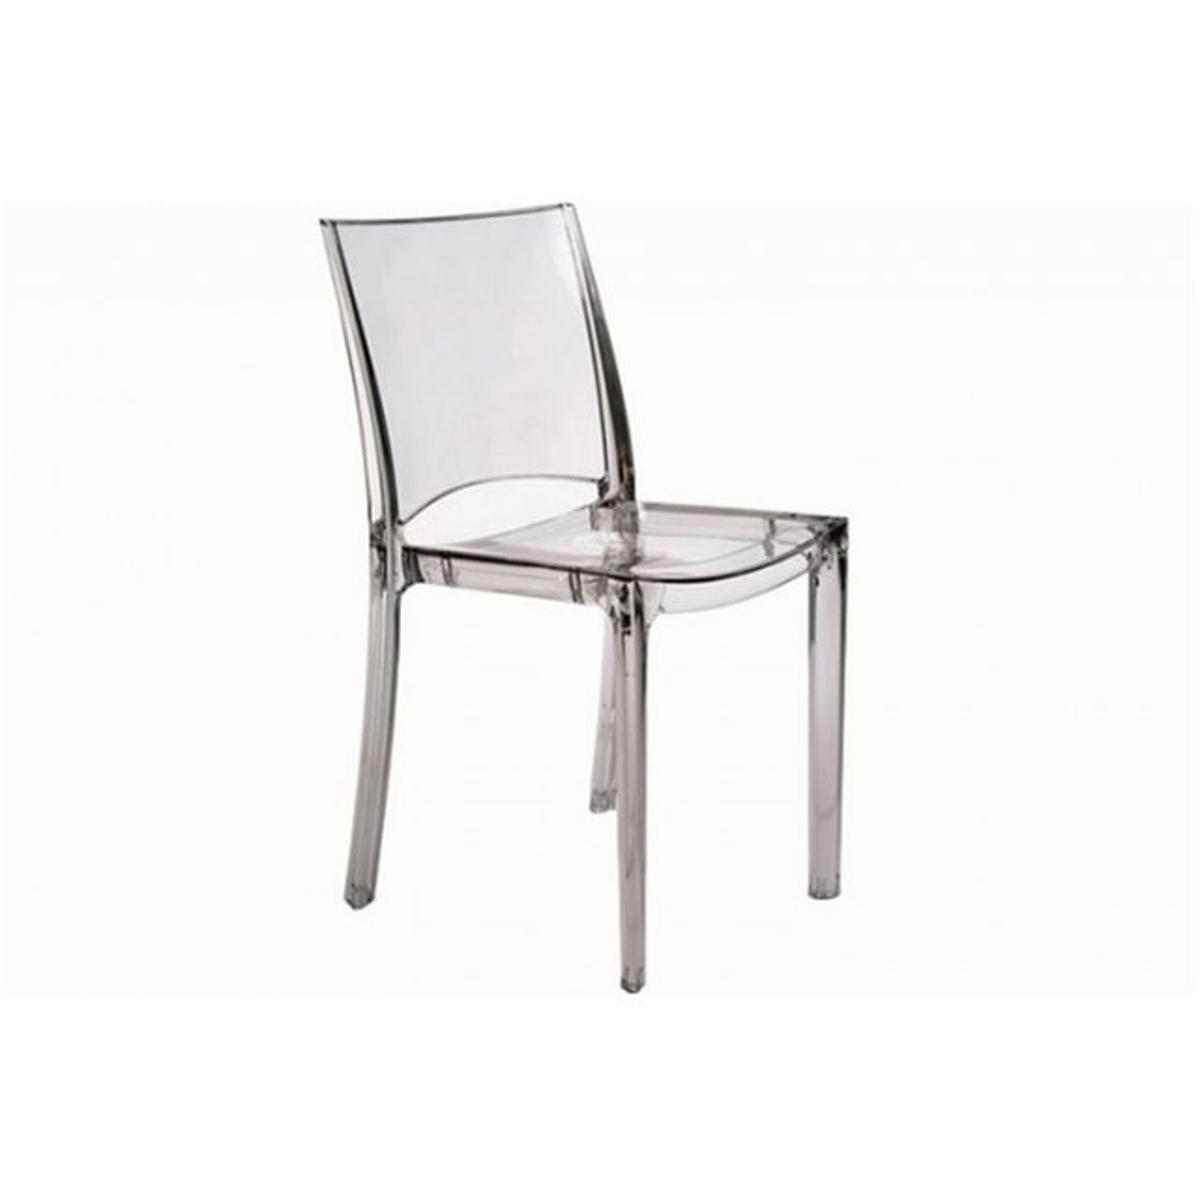 Chaise Design Transparente SOMMET